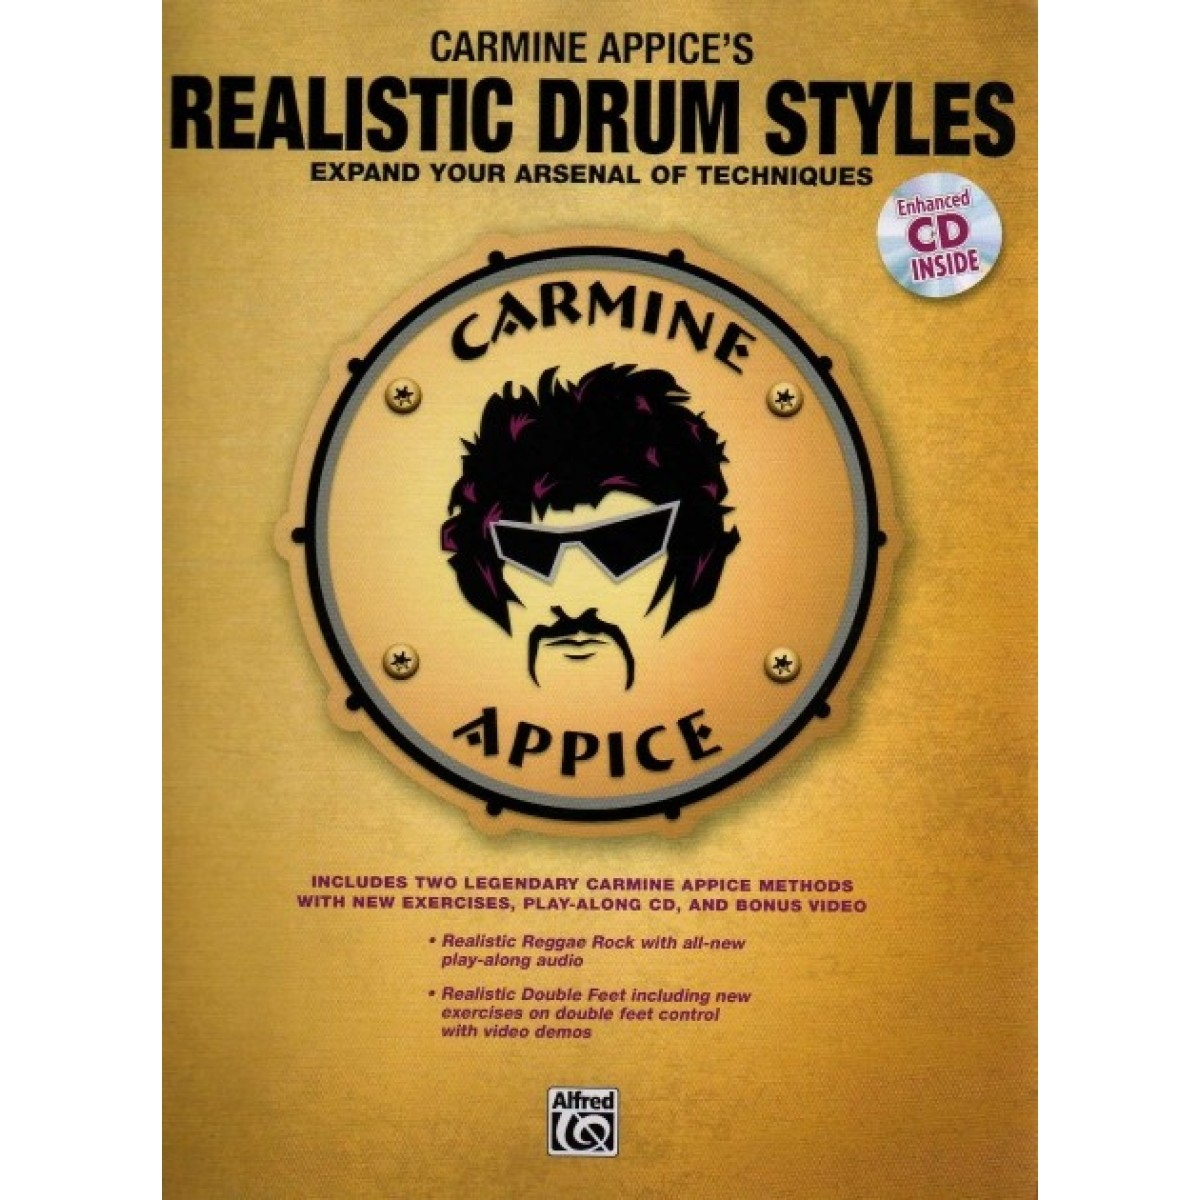 Realistic Drum Styles